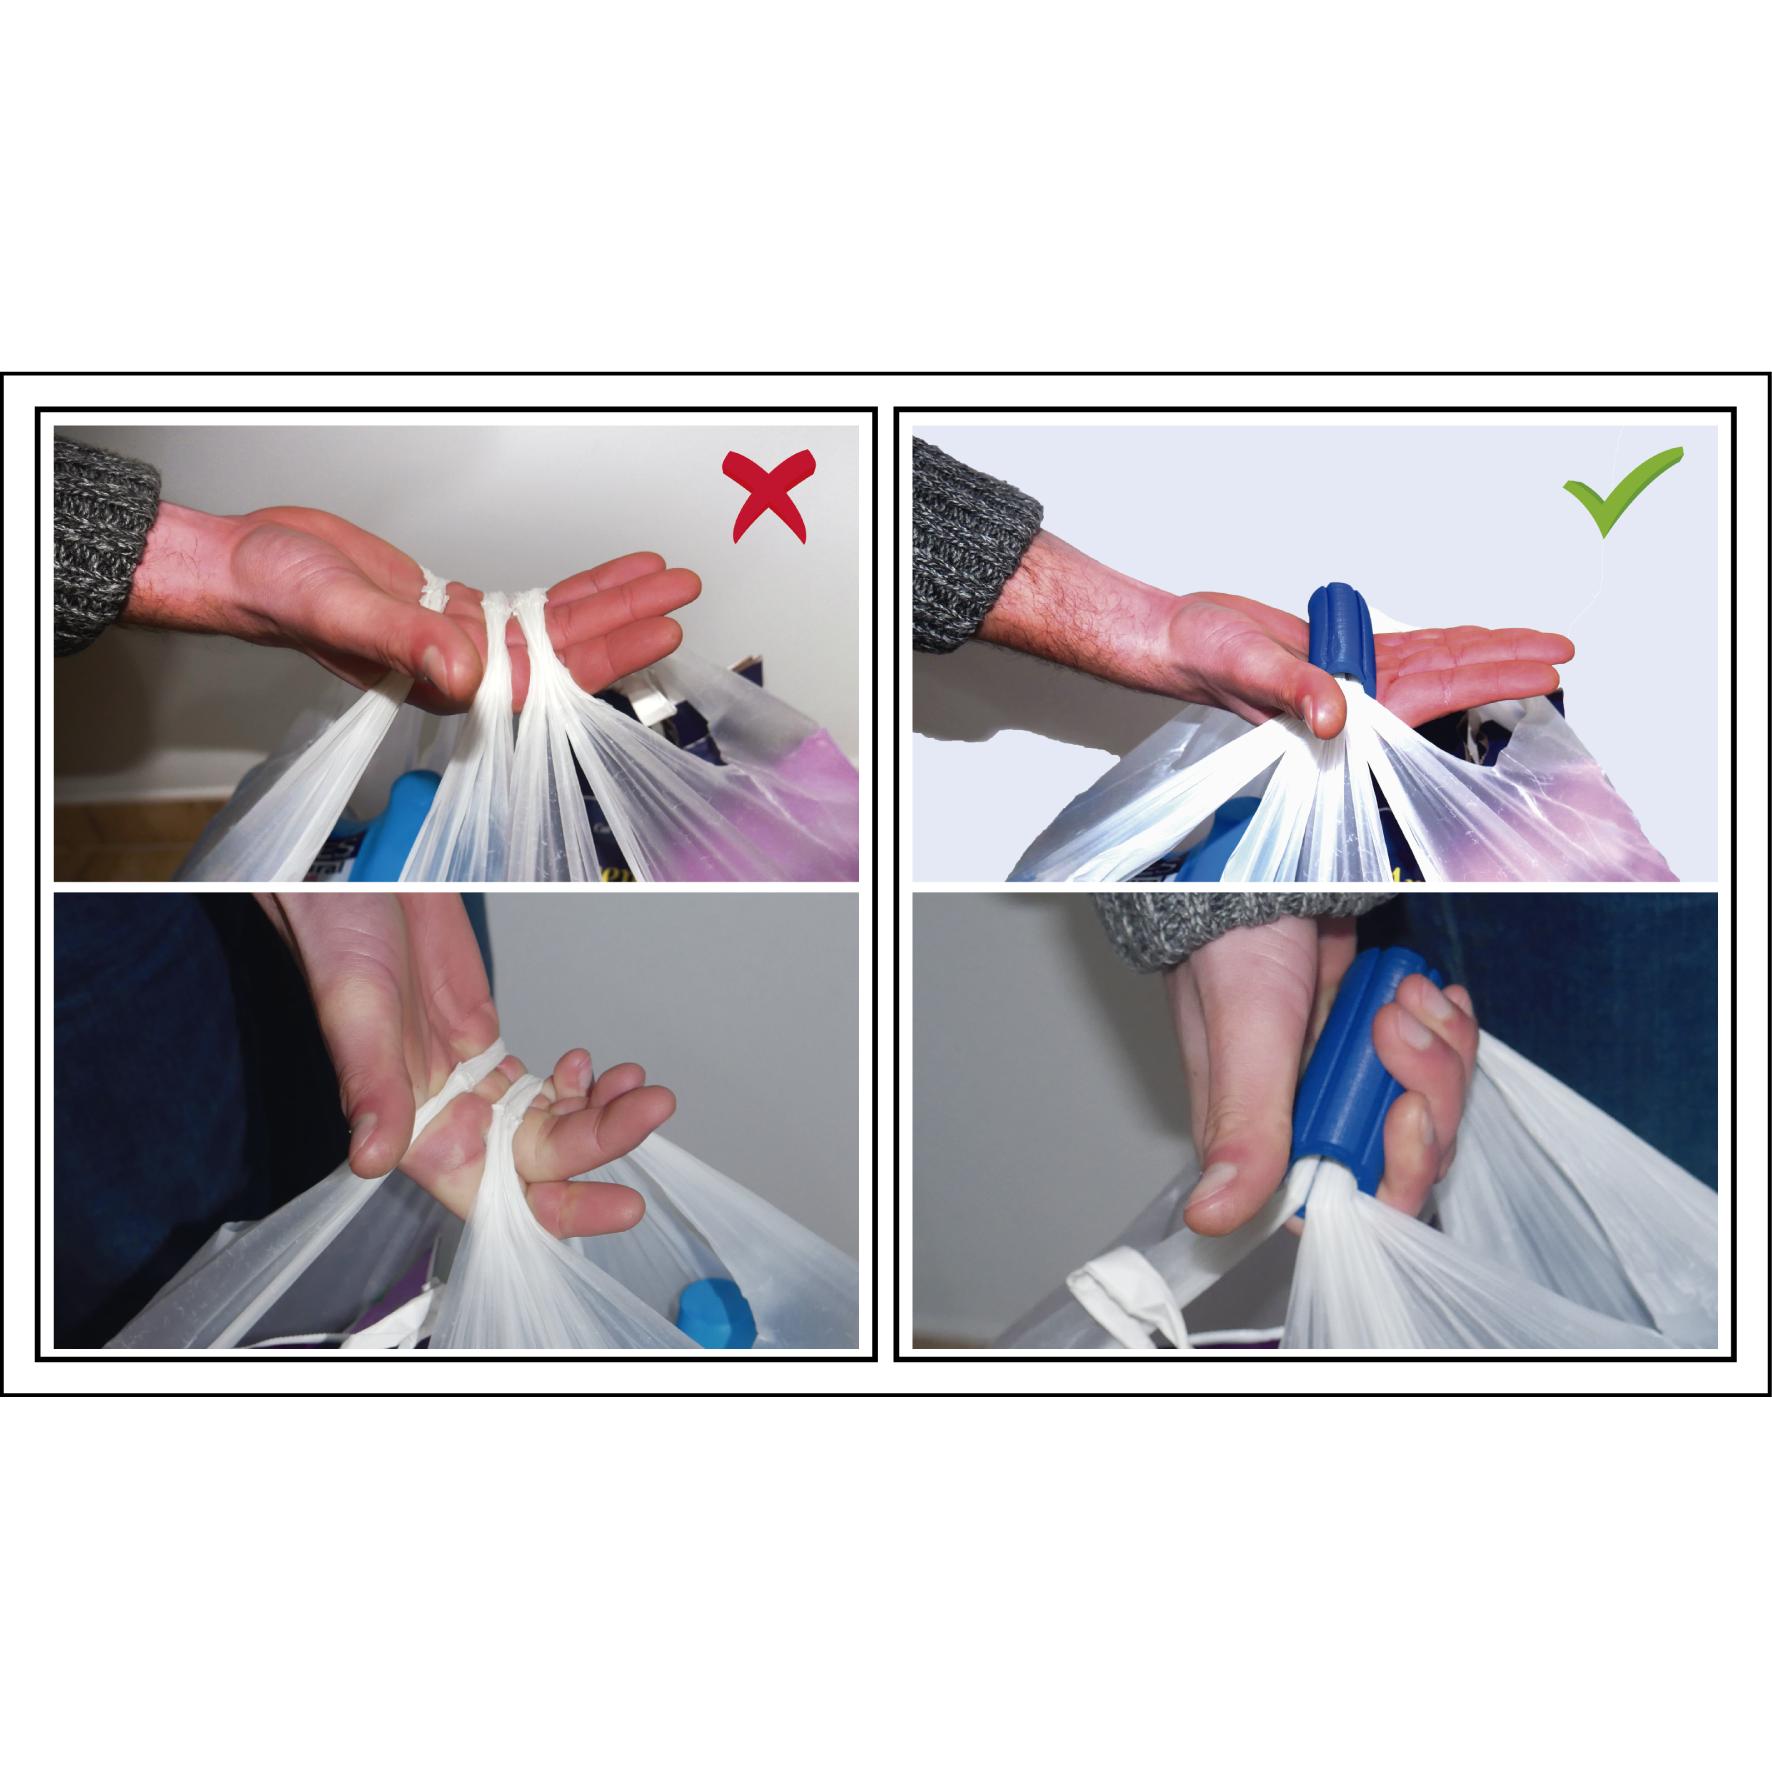 Shopping_bag_handle_02-01.png Download STL file Shopping Bag Handle [Life Hack] • 3D print design, 3DKSTRO